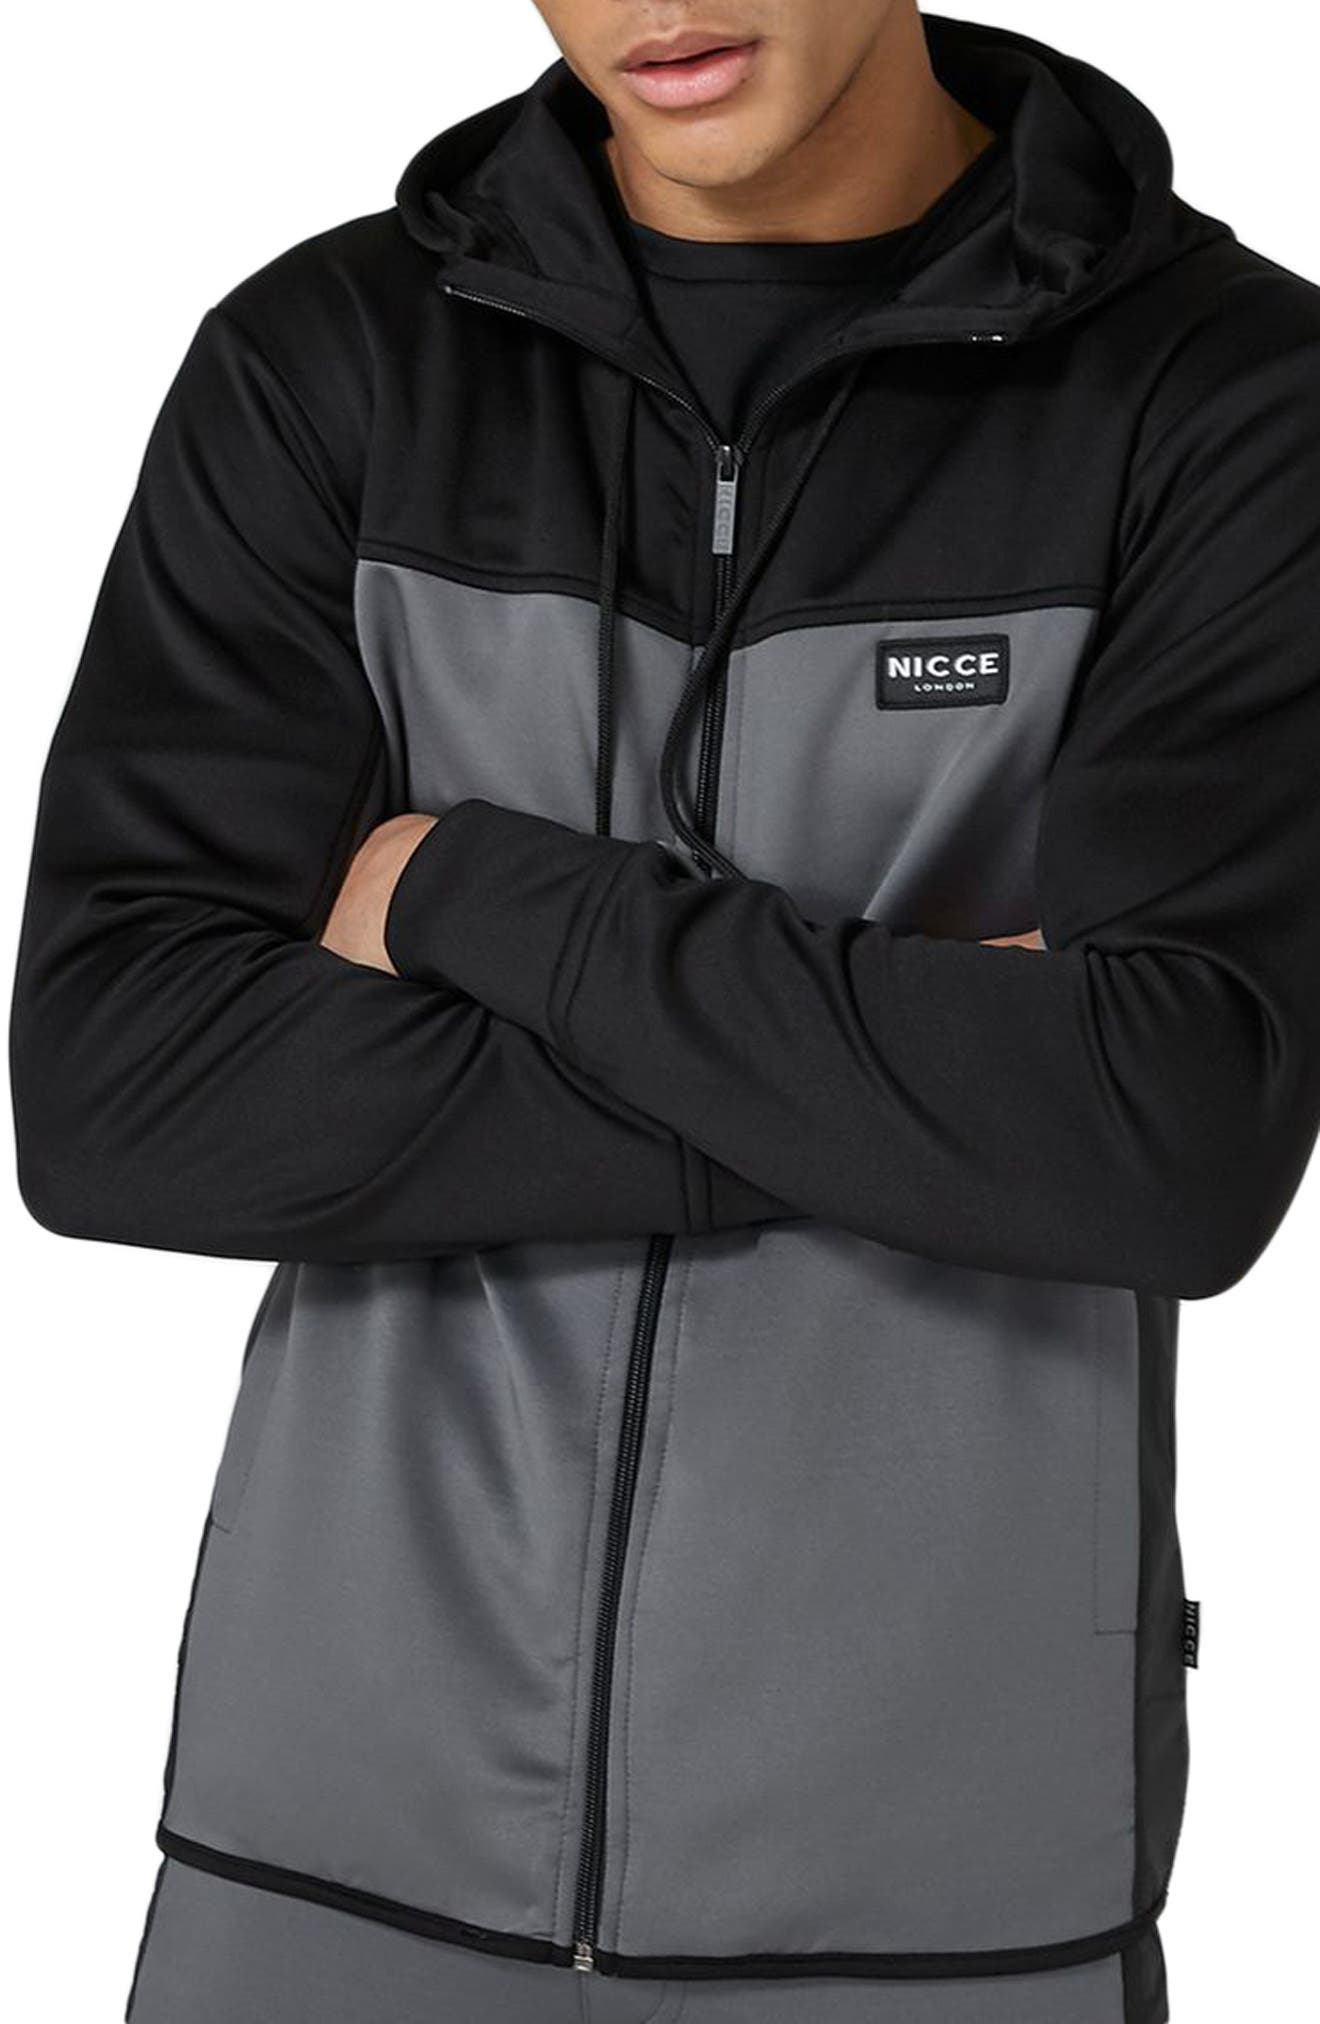 Topshop NICCE Hybrid Track Jacket,                             Main thumbnail 1, color,                             BLACK MULTI